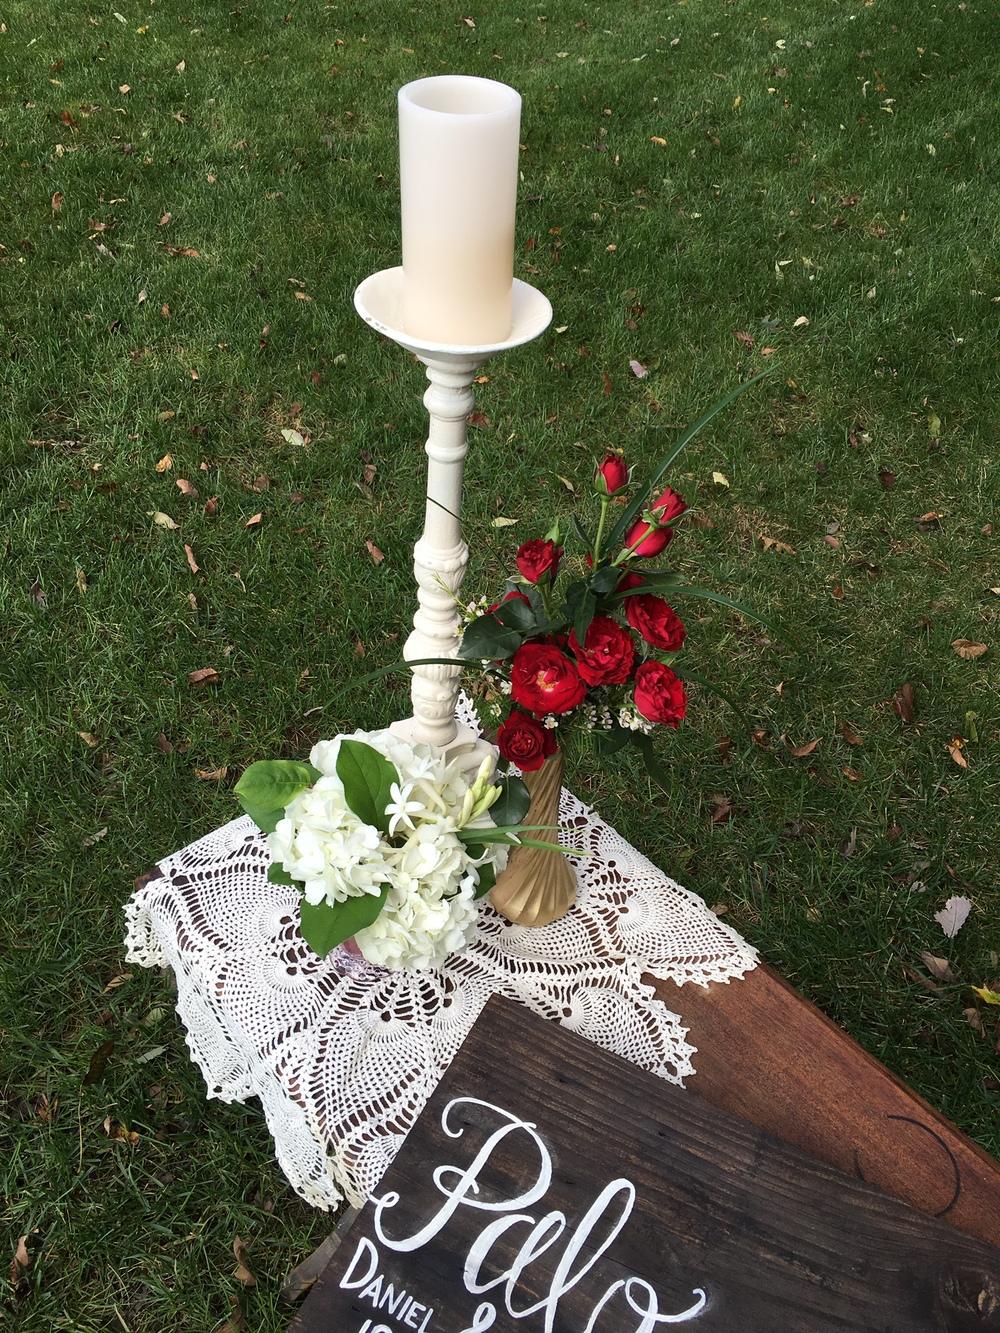 McRae Candlestick Gift Outside.JPG